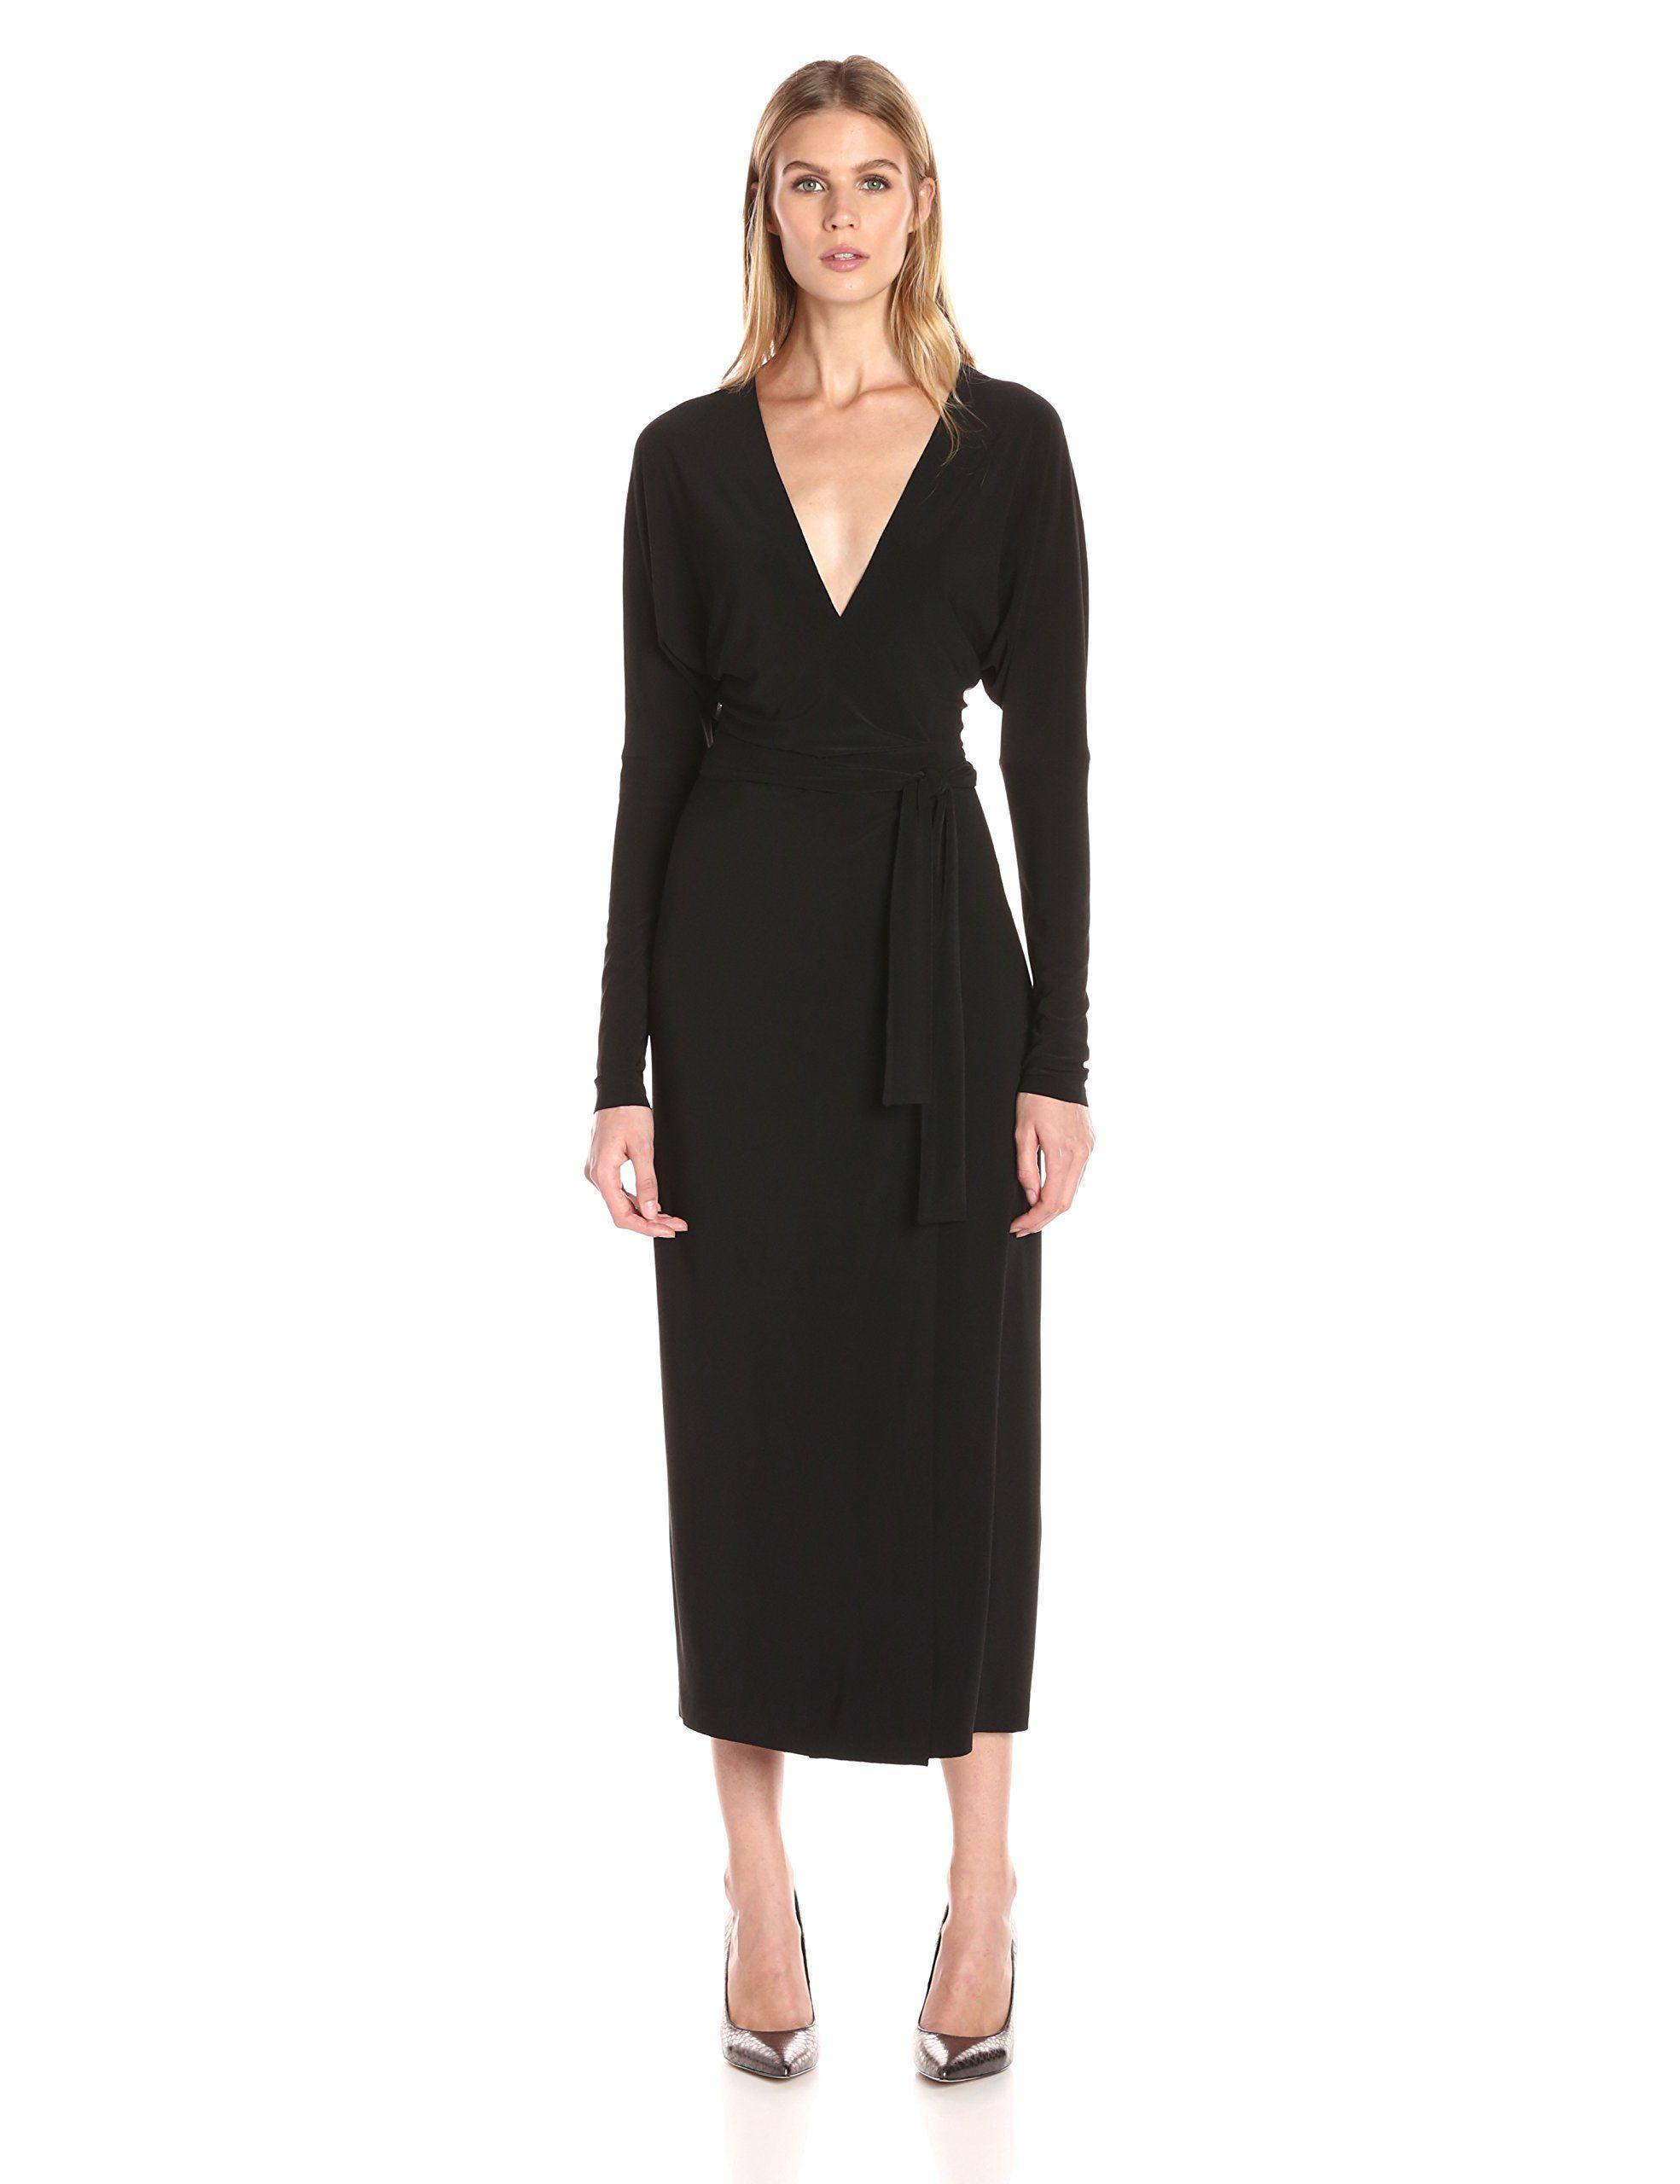 Norma Kamali Women's Dolman Wrap Dress V-Neck Line, Black, S. Wrap ...